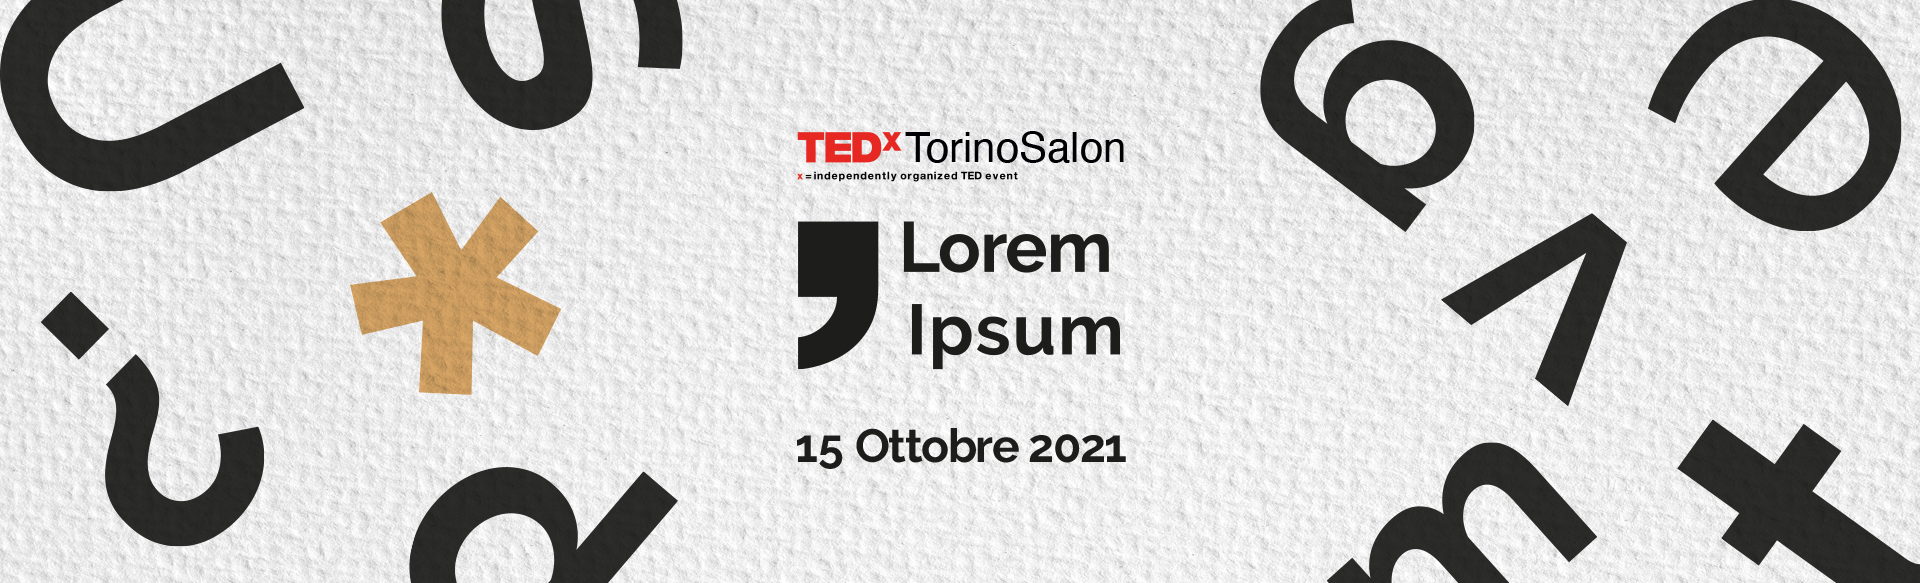 TEDxTorinoSalon Lorem ipsum